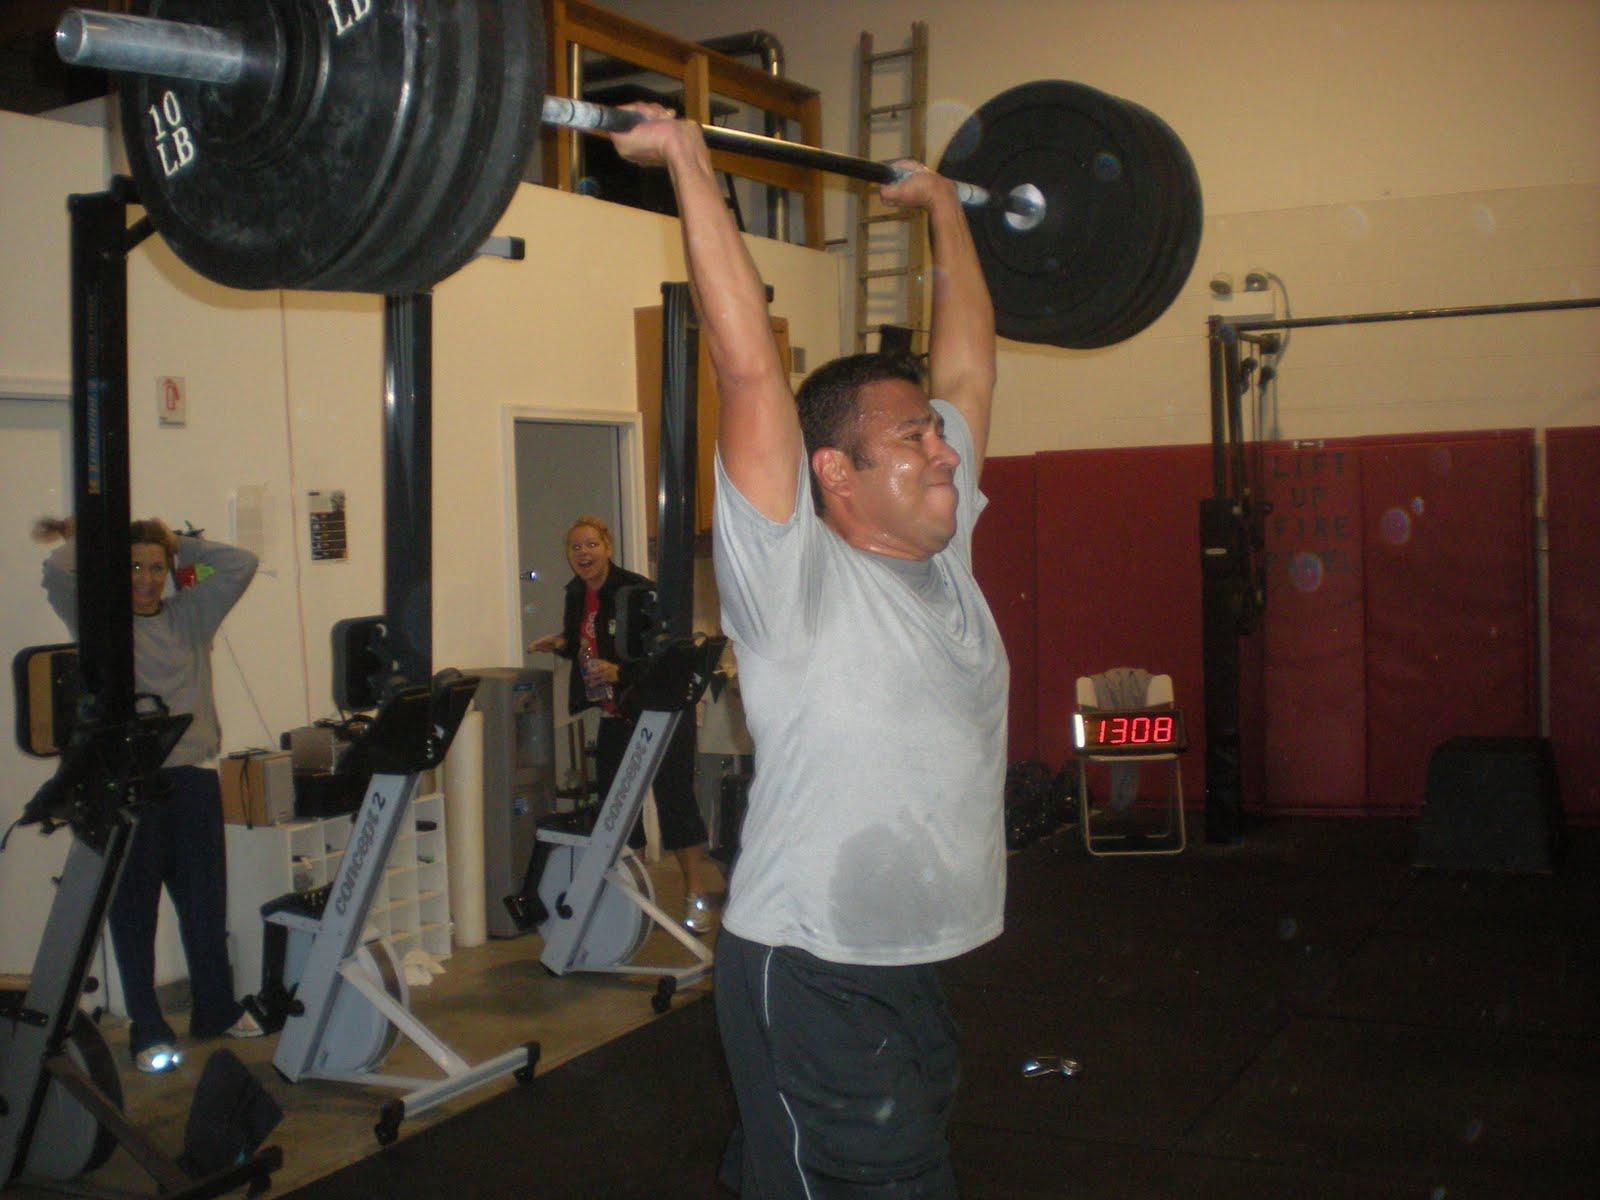 http://1.bp.blogspot.com/_9gWZ1R9-gOg/TMbJip1qULI/AAAAAAAABio/cH6id4bGOc8/s1600/CrossFit+1929.jpg